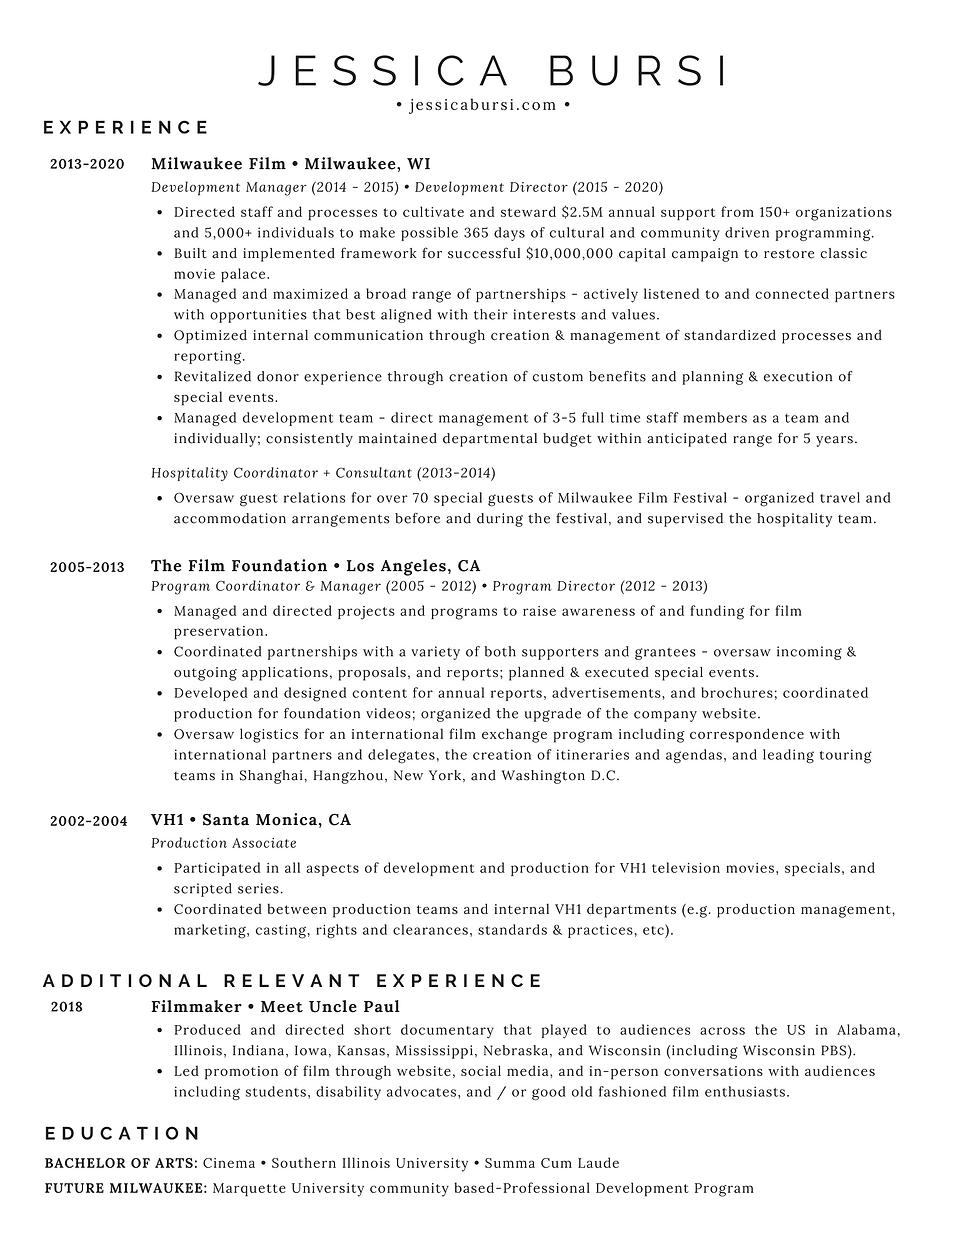 Jessica Bursi Resume - 2020 (Web version